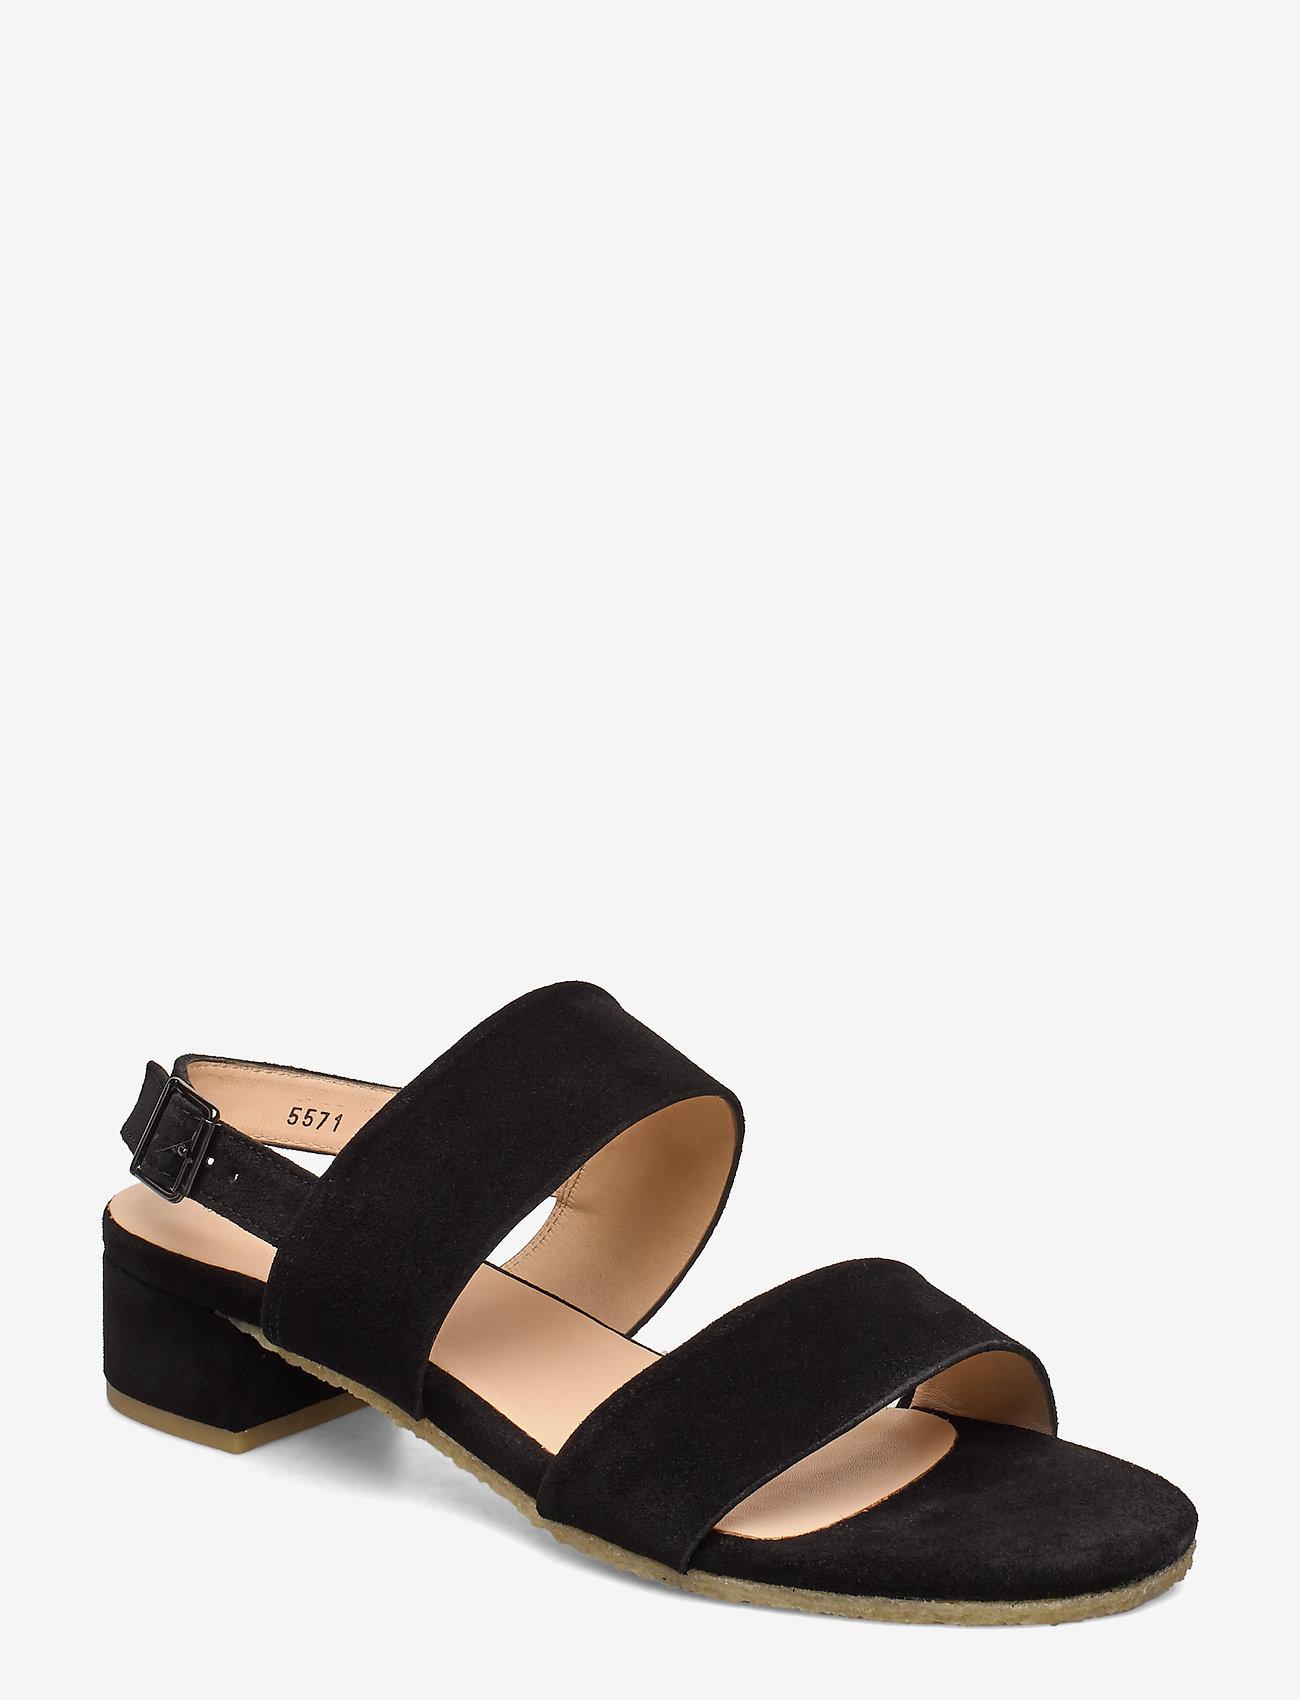 ANGULUS - Sandals - flat - sandalen met hak - 1163 black - 0